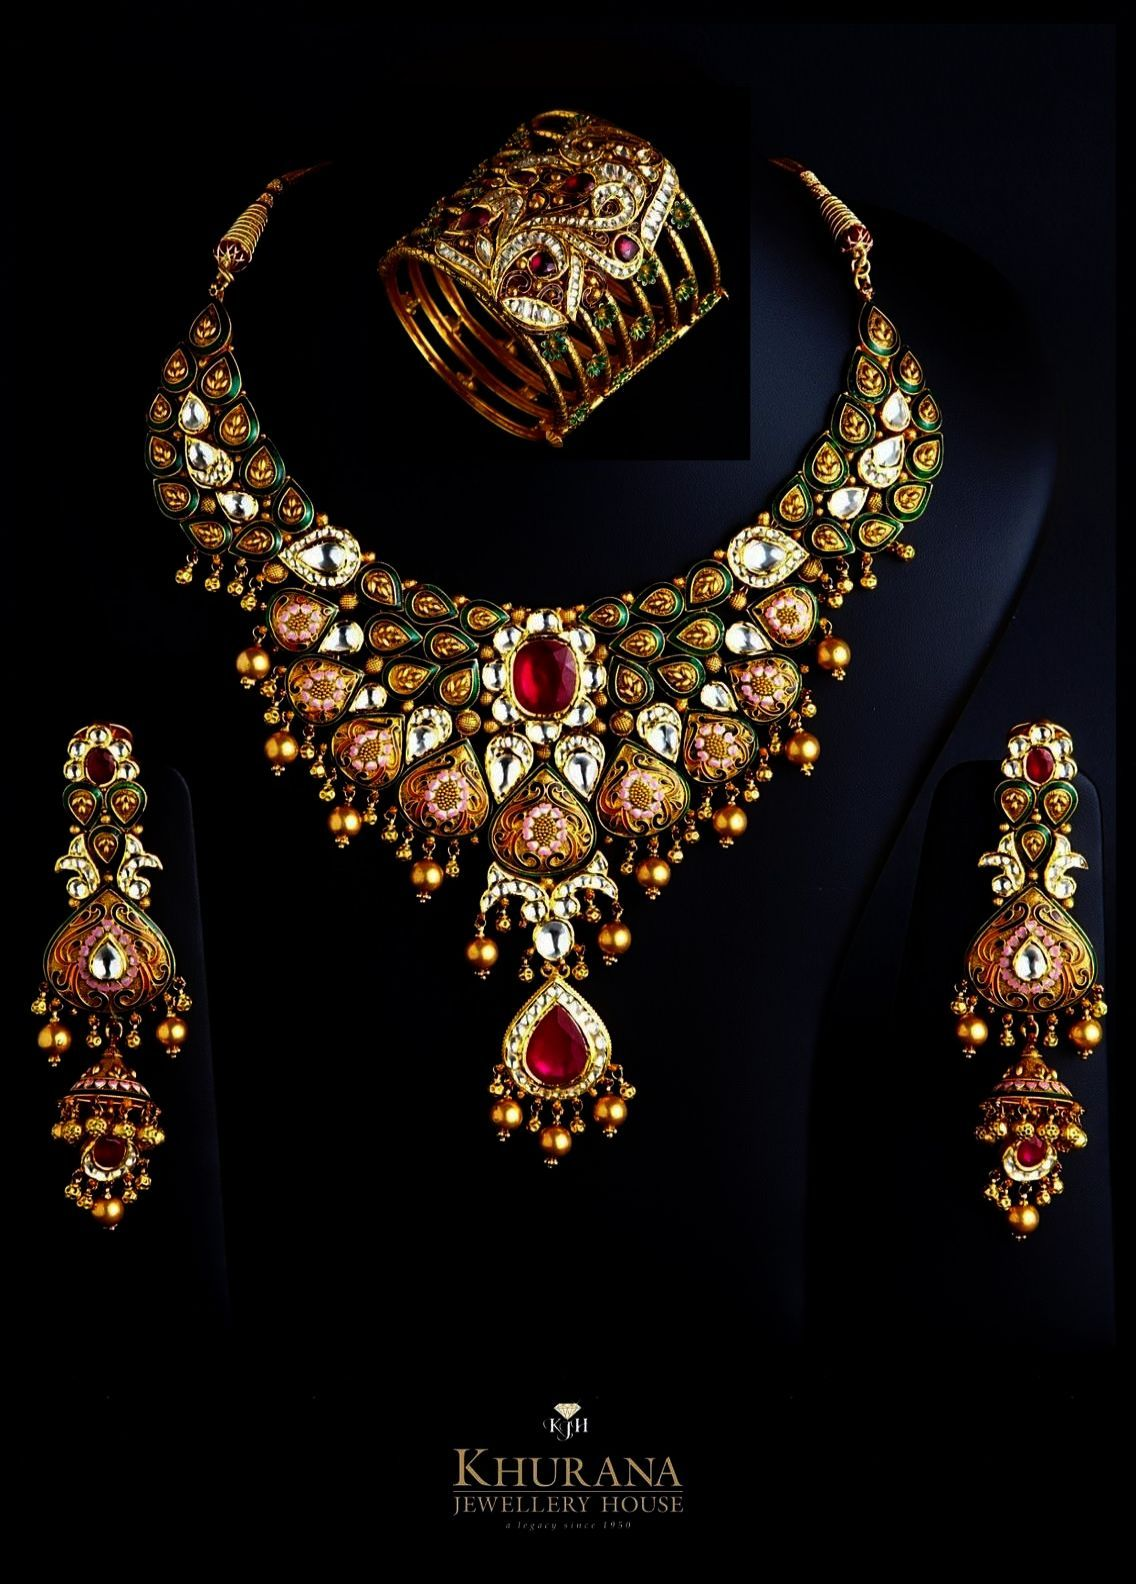 Diamond Earring Mens Diamond Jewelry For 10 Year Anniversary Luxury Jewelry Brands Jewelry Diamond